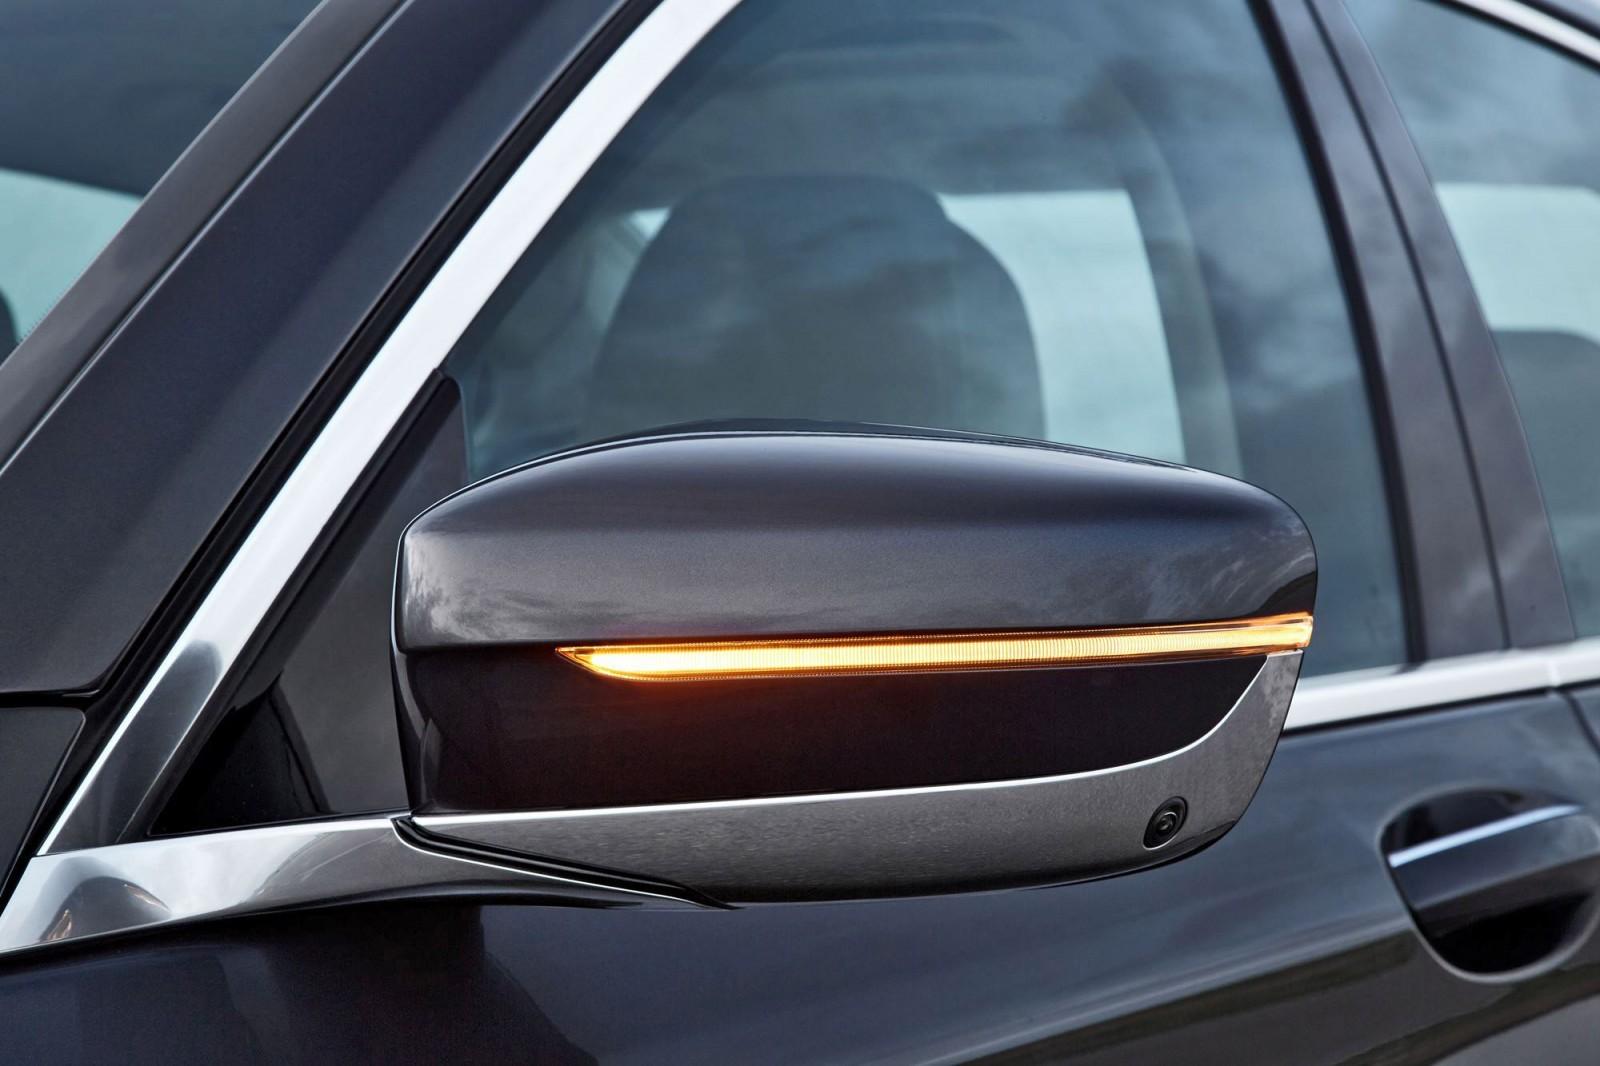 2016 BMW 750 Exterior Photos 27